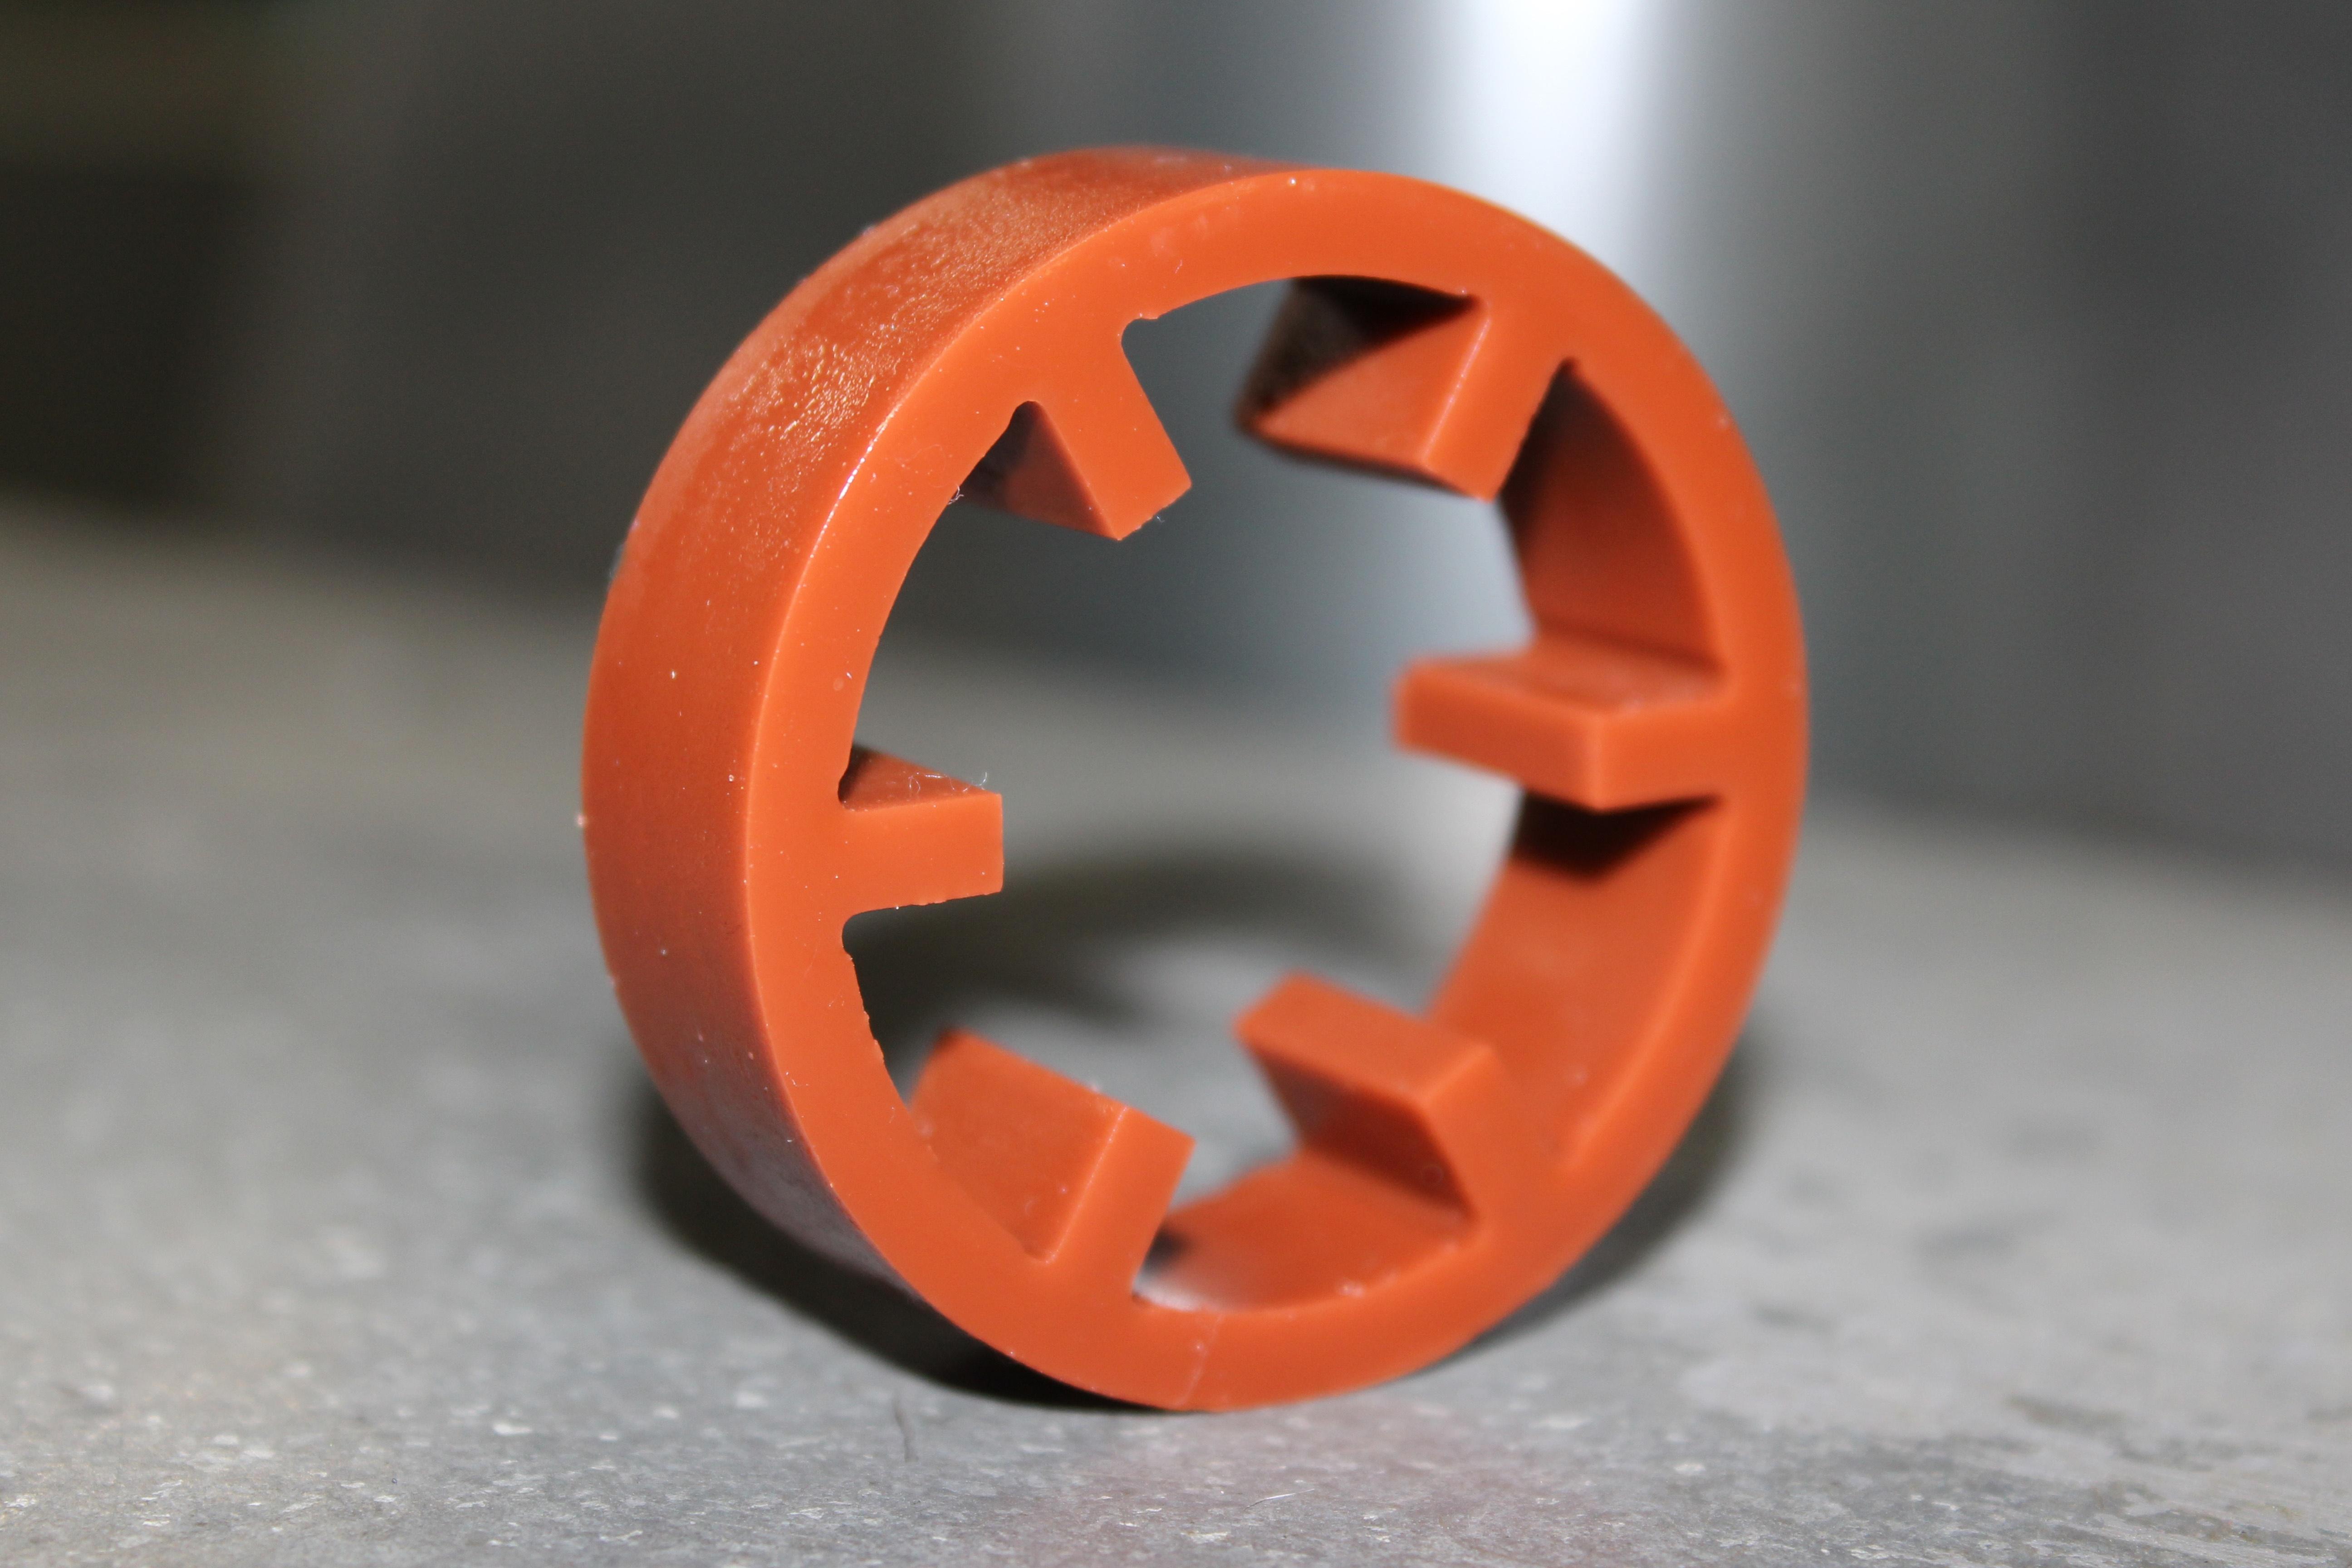 Cast Molding vs. Injection Molding